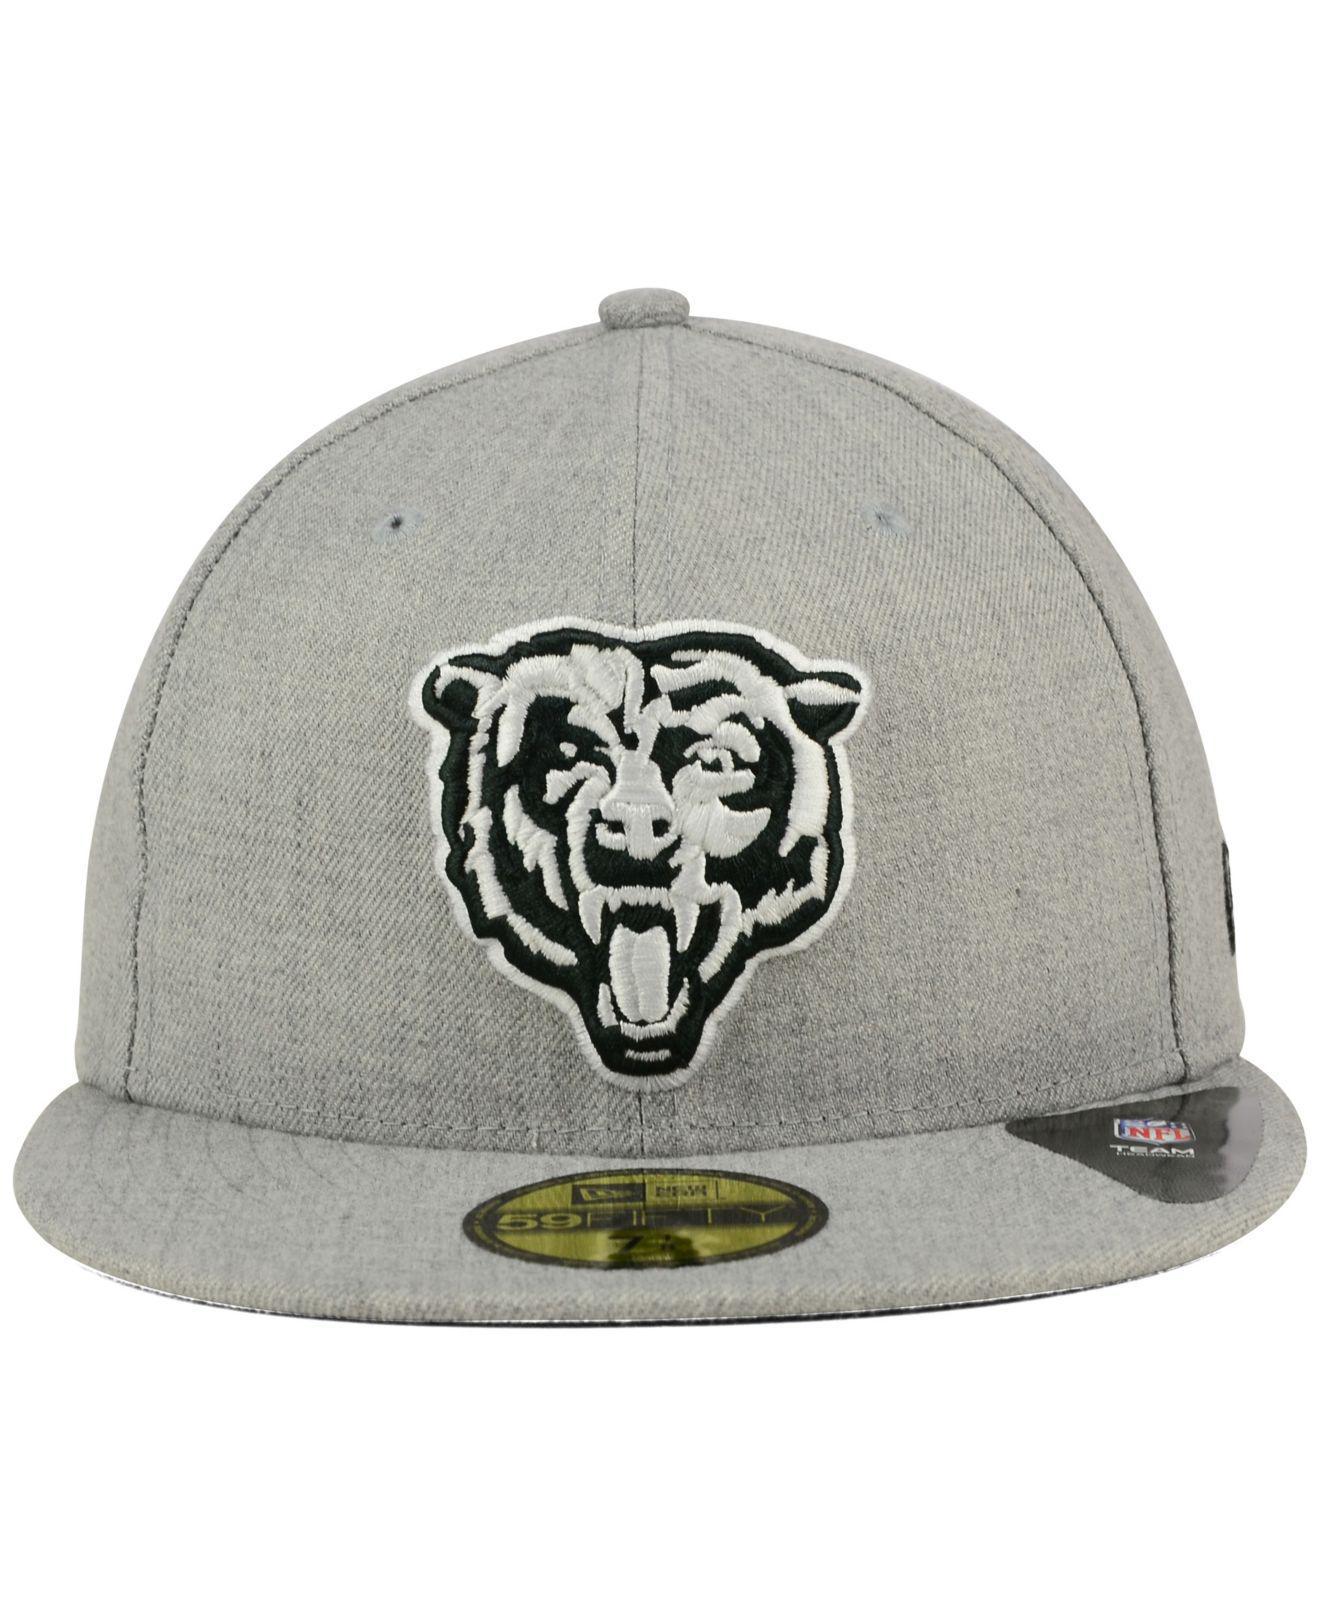 abb66e624f7 Lyst - KTZ Chicago Bears Heather Black White 59fifty Cap in Gray for Men